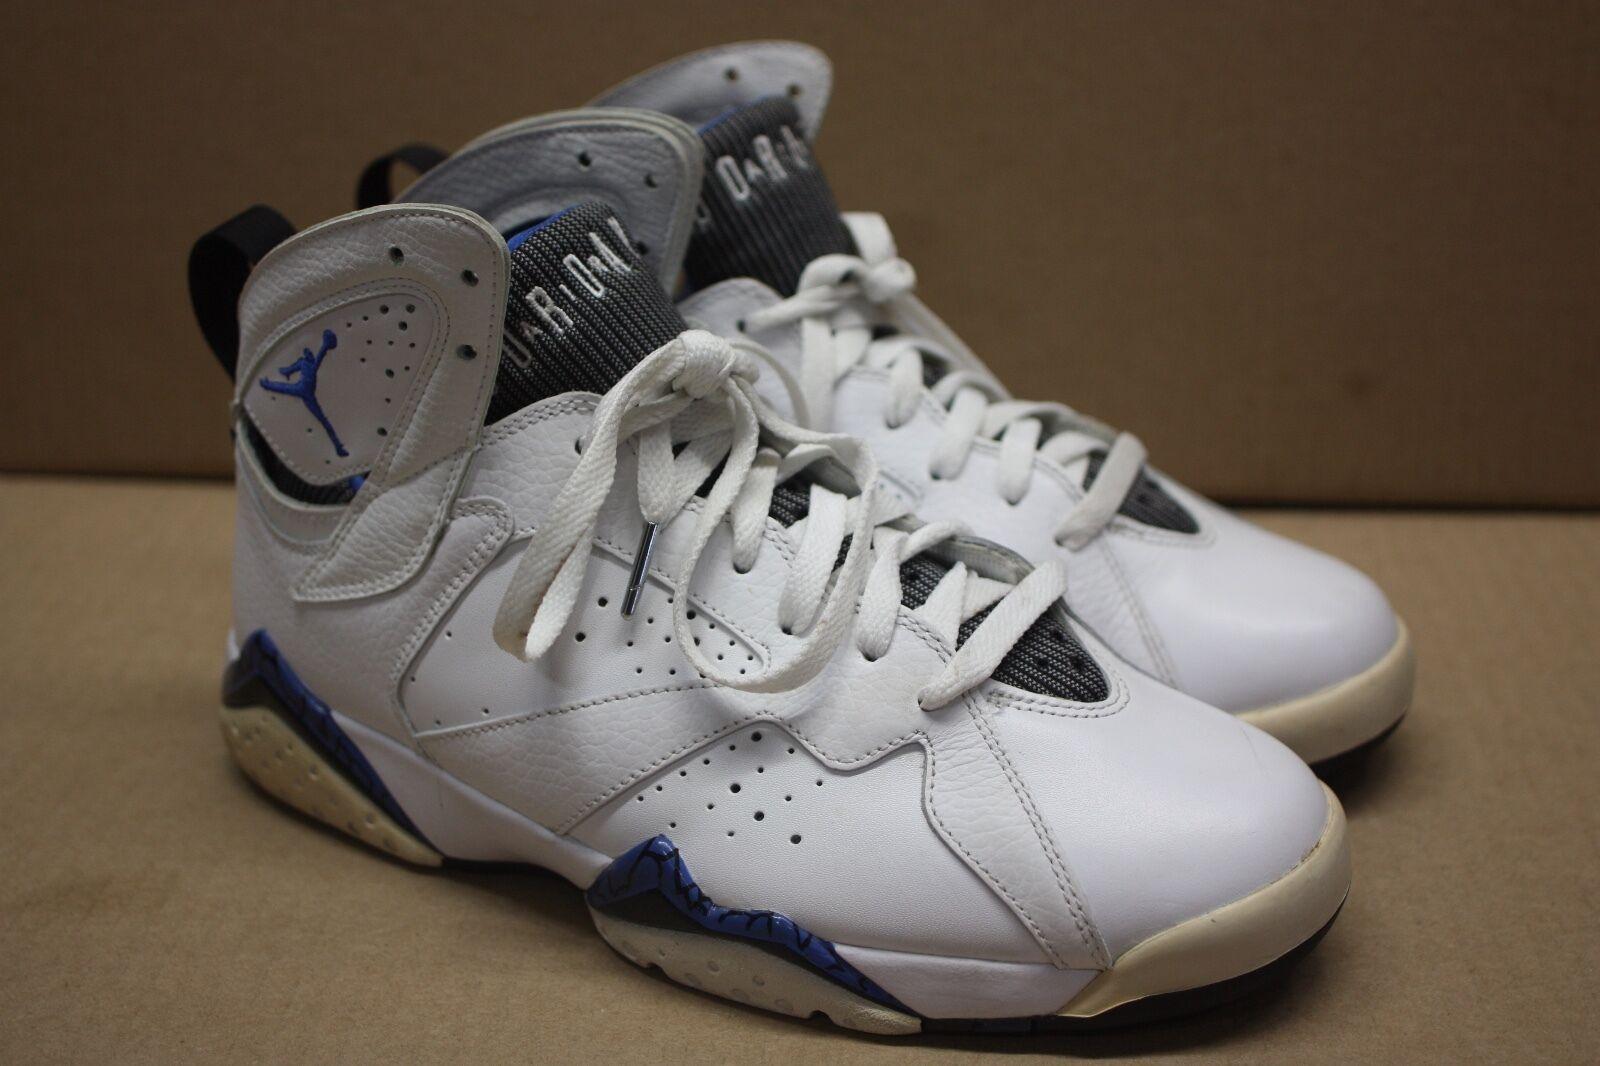 Nike air jordan v 7 retro - orlando dmp dmp dmp weiß / blau / blk 304775 161 sz 8us / 7uk / 4 c45cff